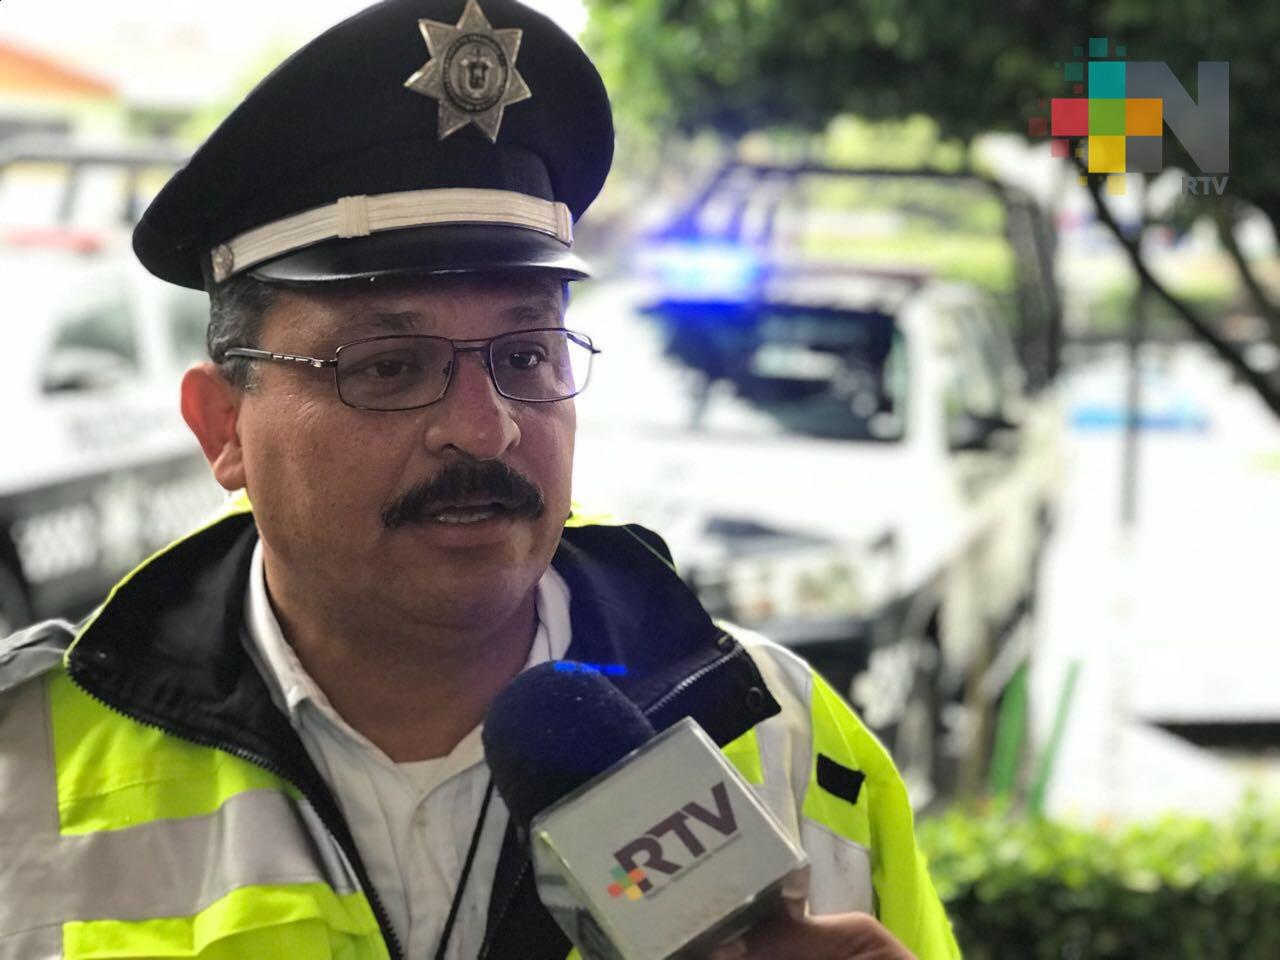 Exhorta Tránsito de Coatzacoalcos a manejar con precaución por las lluvias